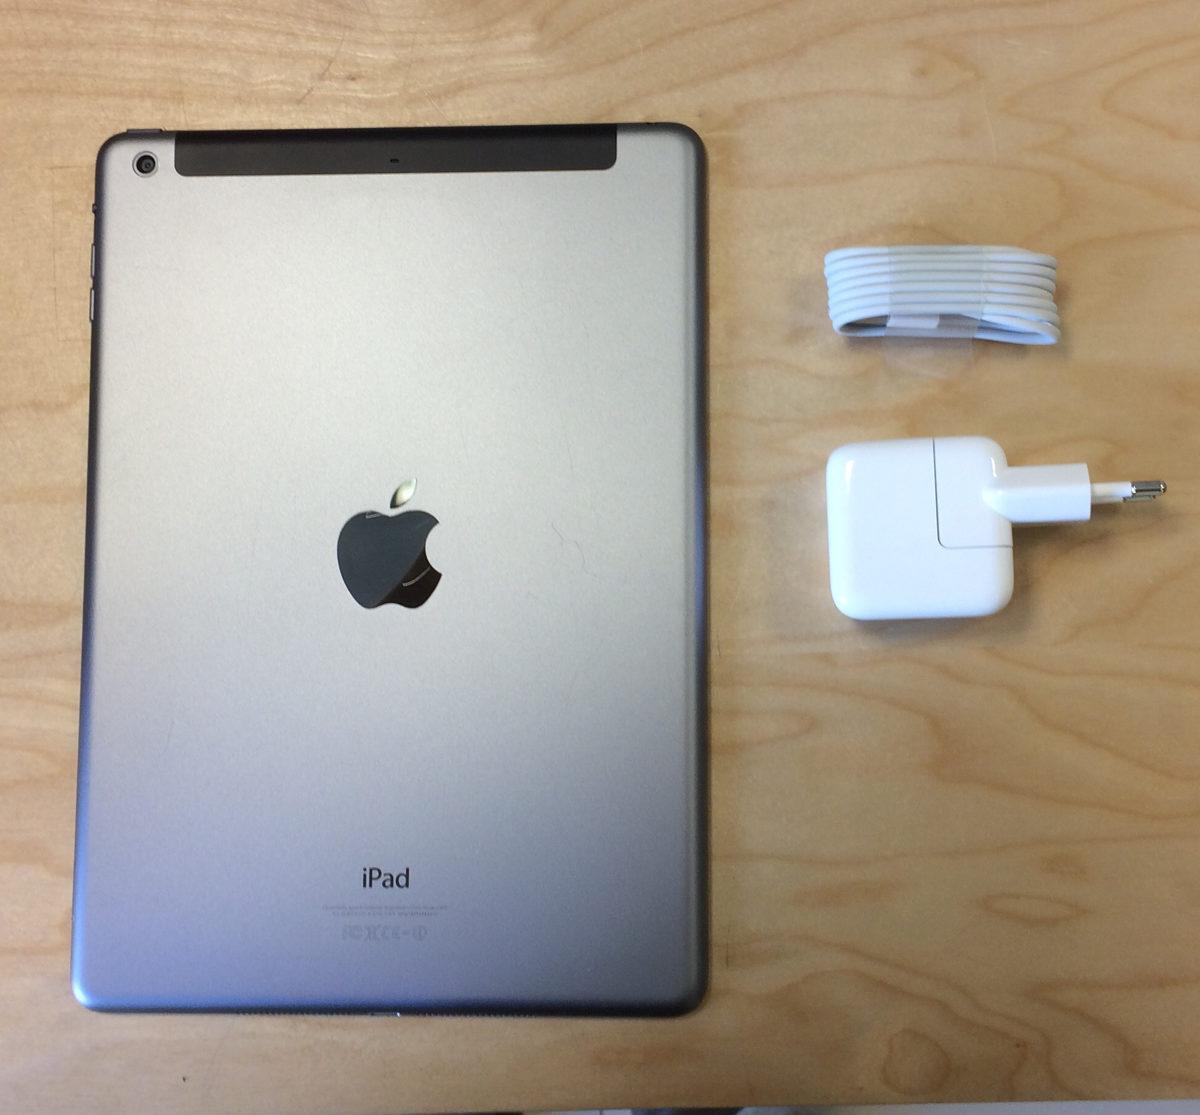 iPad Air (Wi-Fi + 4G), 64 GB, Space Gray, imagen 2